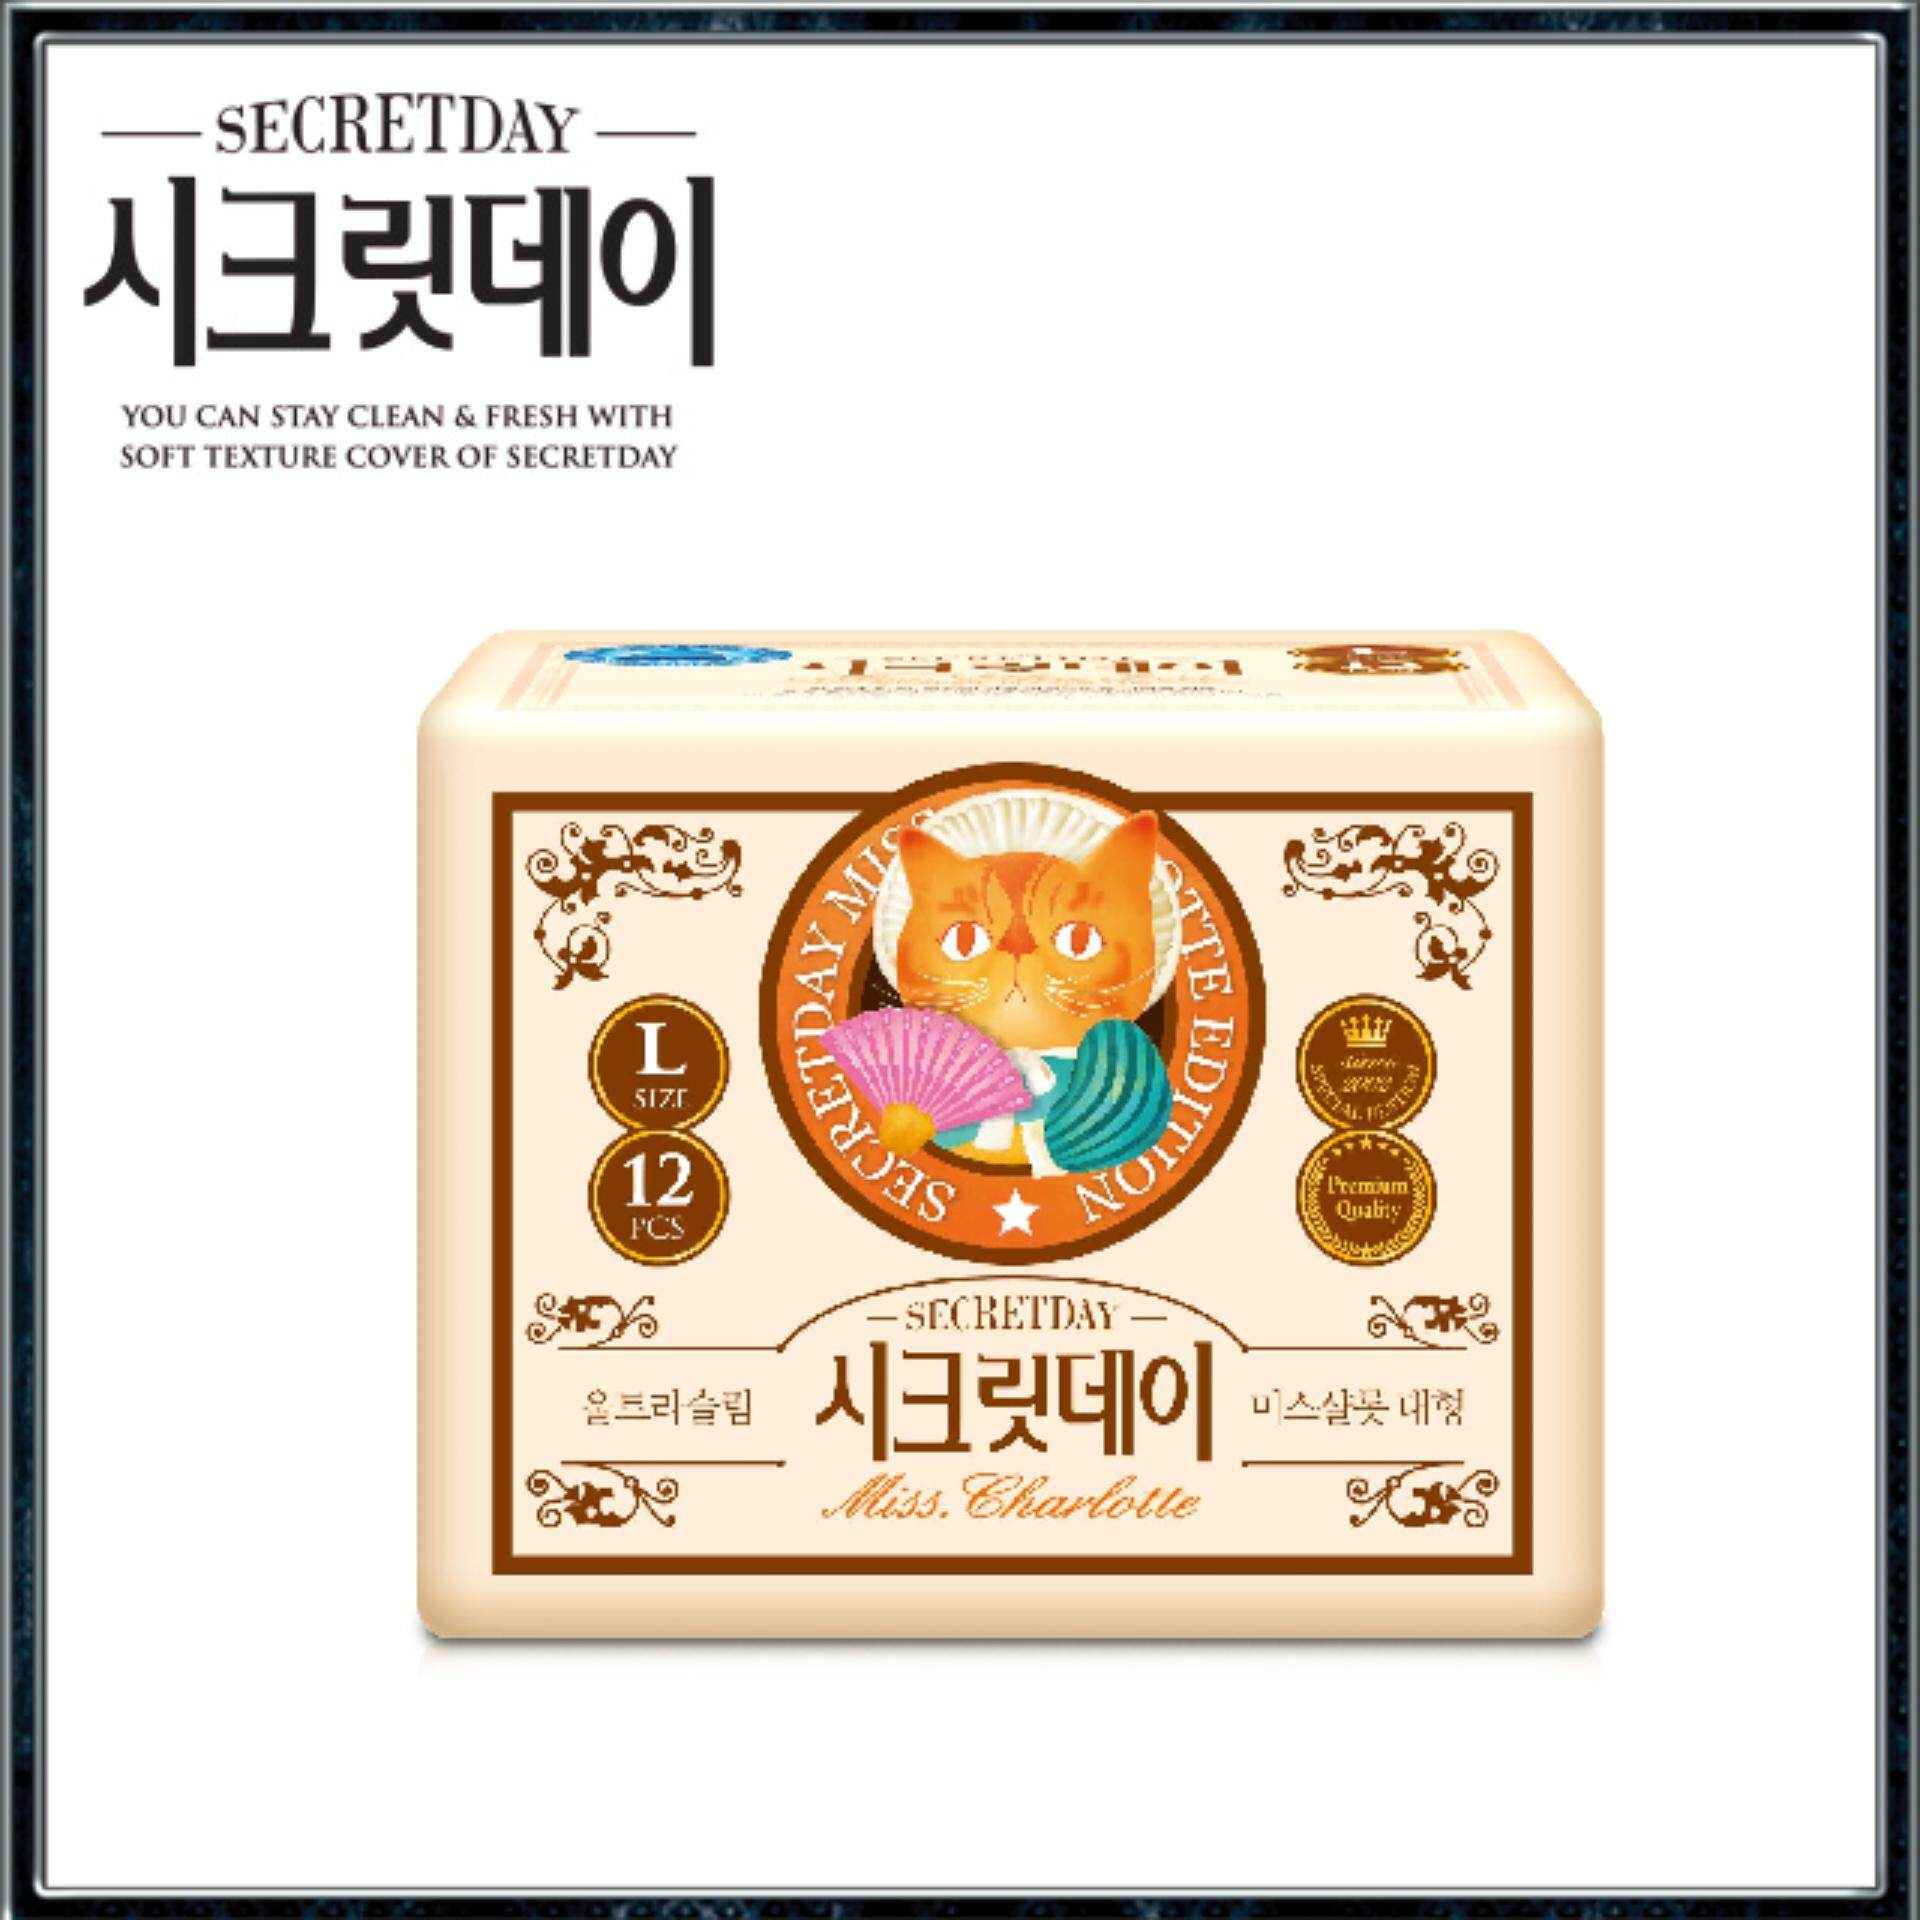 Secret Day Miss Charlotte Ultra Thin L (28.5cm) 12pcs (Korea No.1)